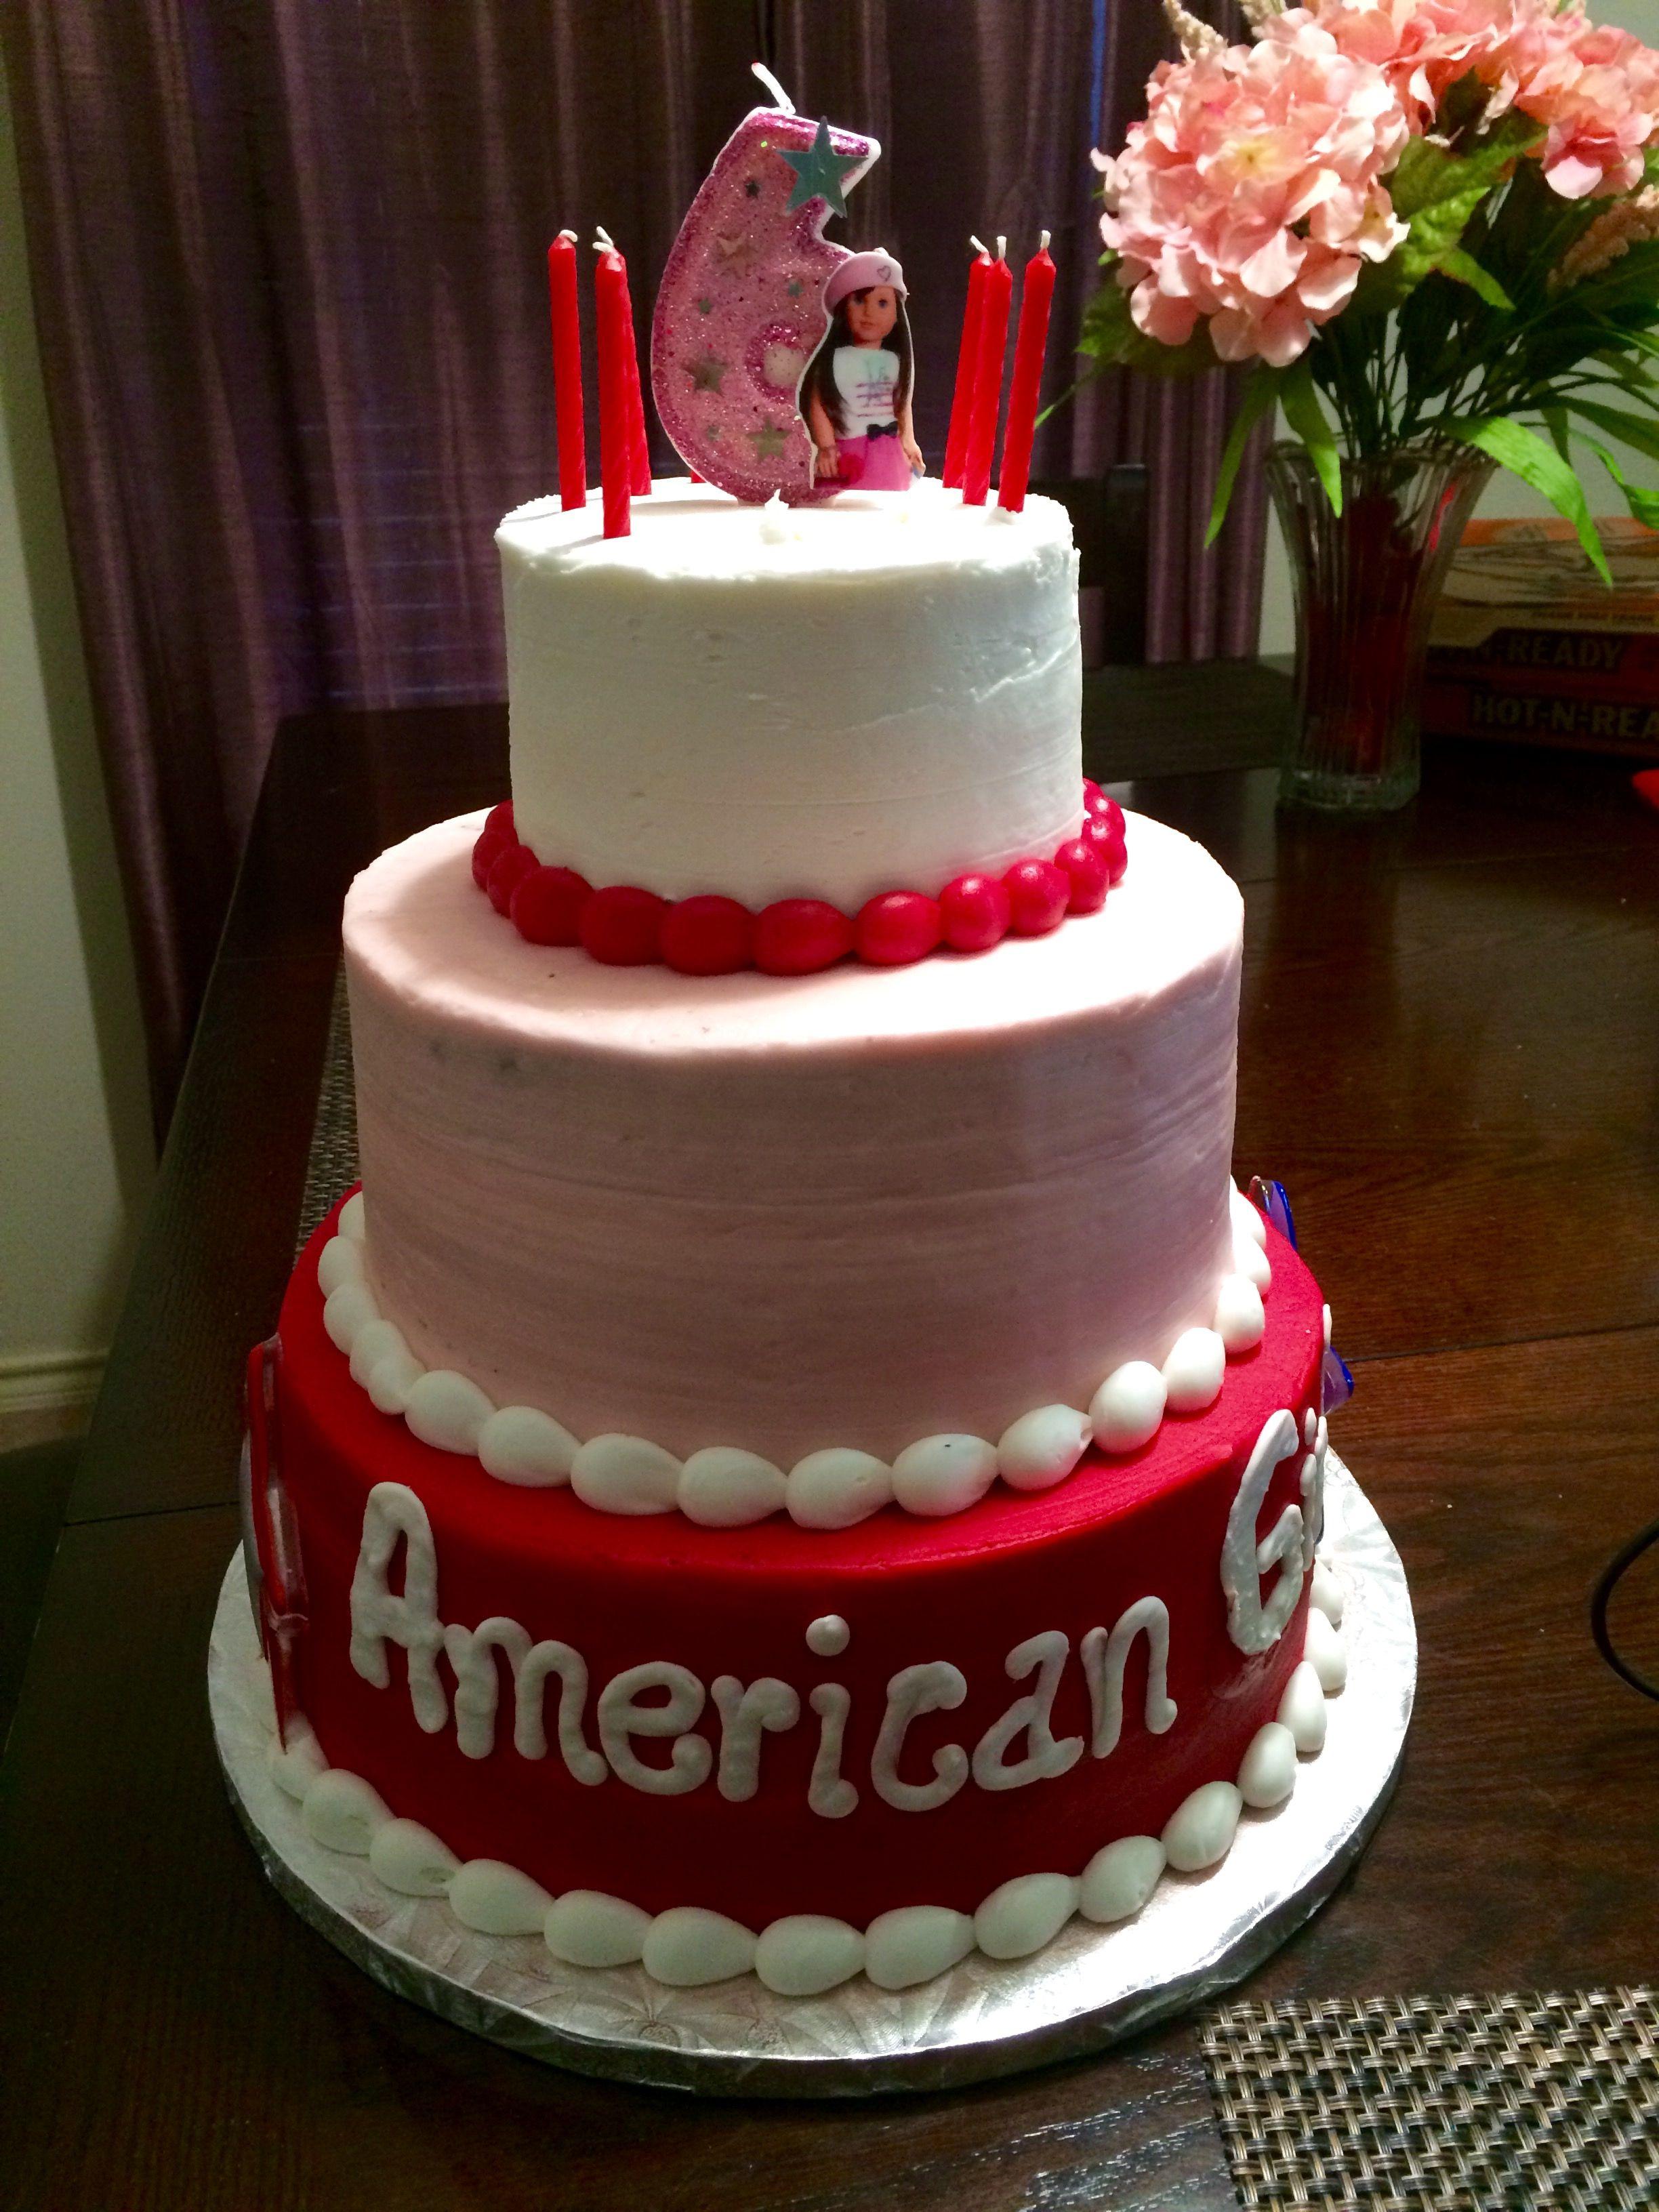 Astounding American Girl Cake From Sams Club 3 Tier American Girl Cakes Personalised Birthday Cards Paralily Jamesorg